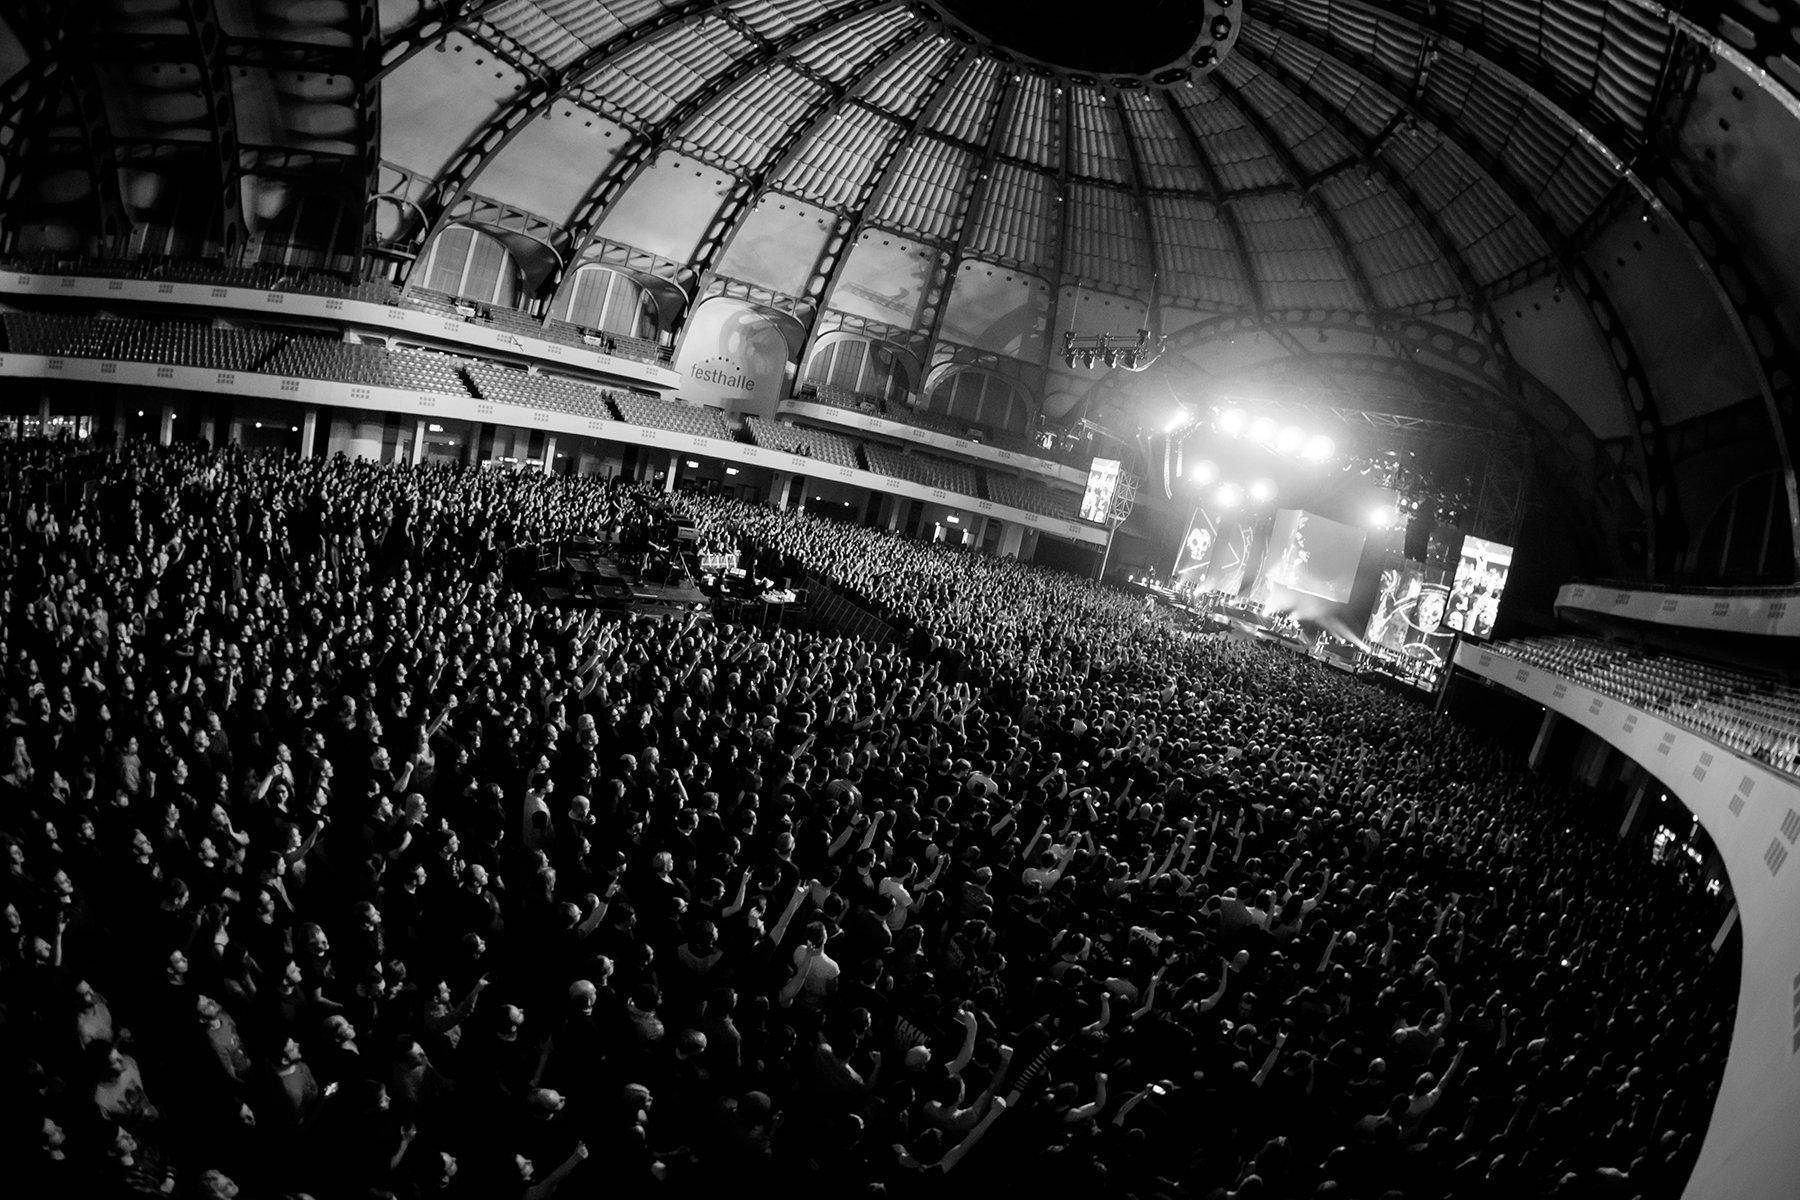 Thank you Frankfurt! #thestageworldtour #avengedsevenfold ��: Rafa Alcantara https://t.co/4mIOxcHxm5